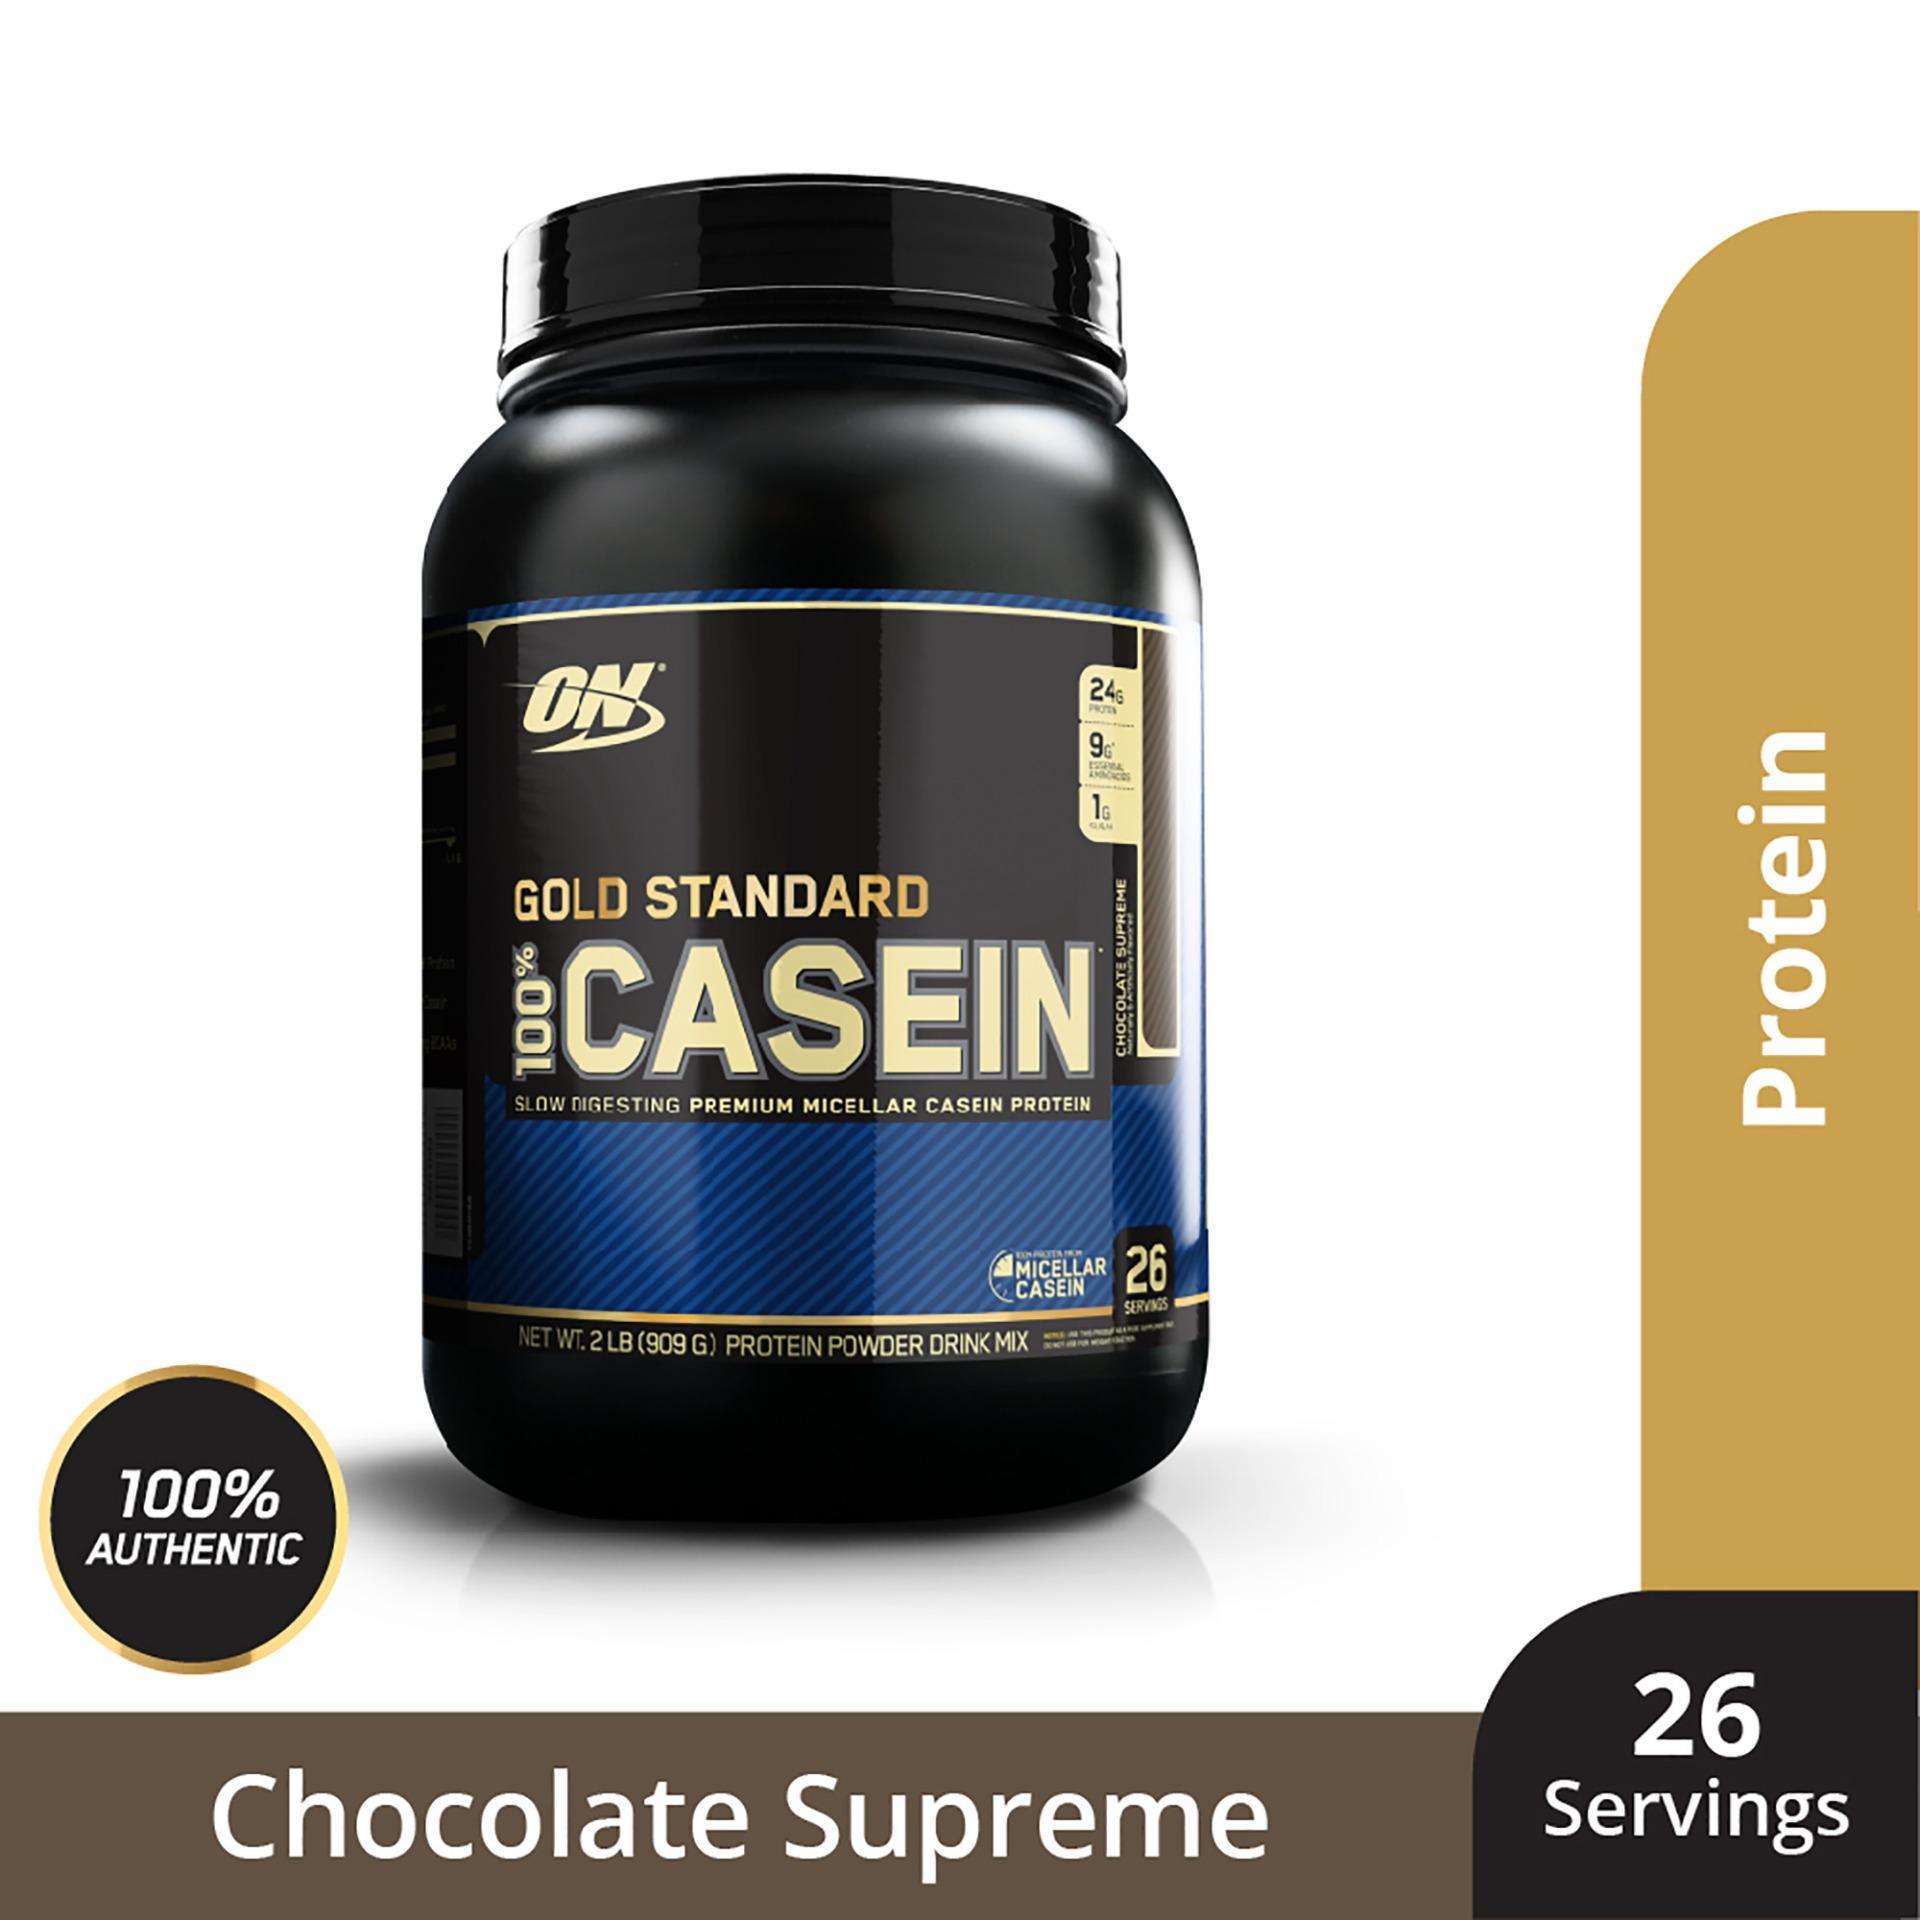 Thực phẩm bổ sung Optimum NutritionGold Standard 100% Casein Chocolate Supreme 2 lbs nhập khẩu